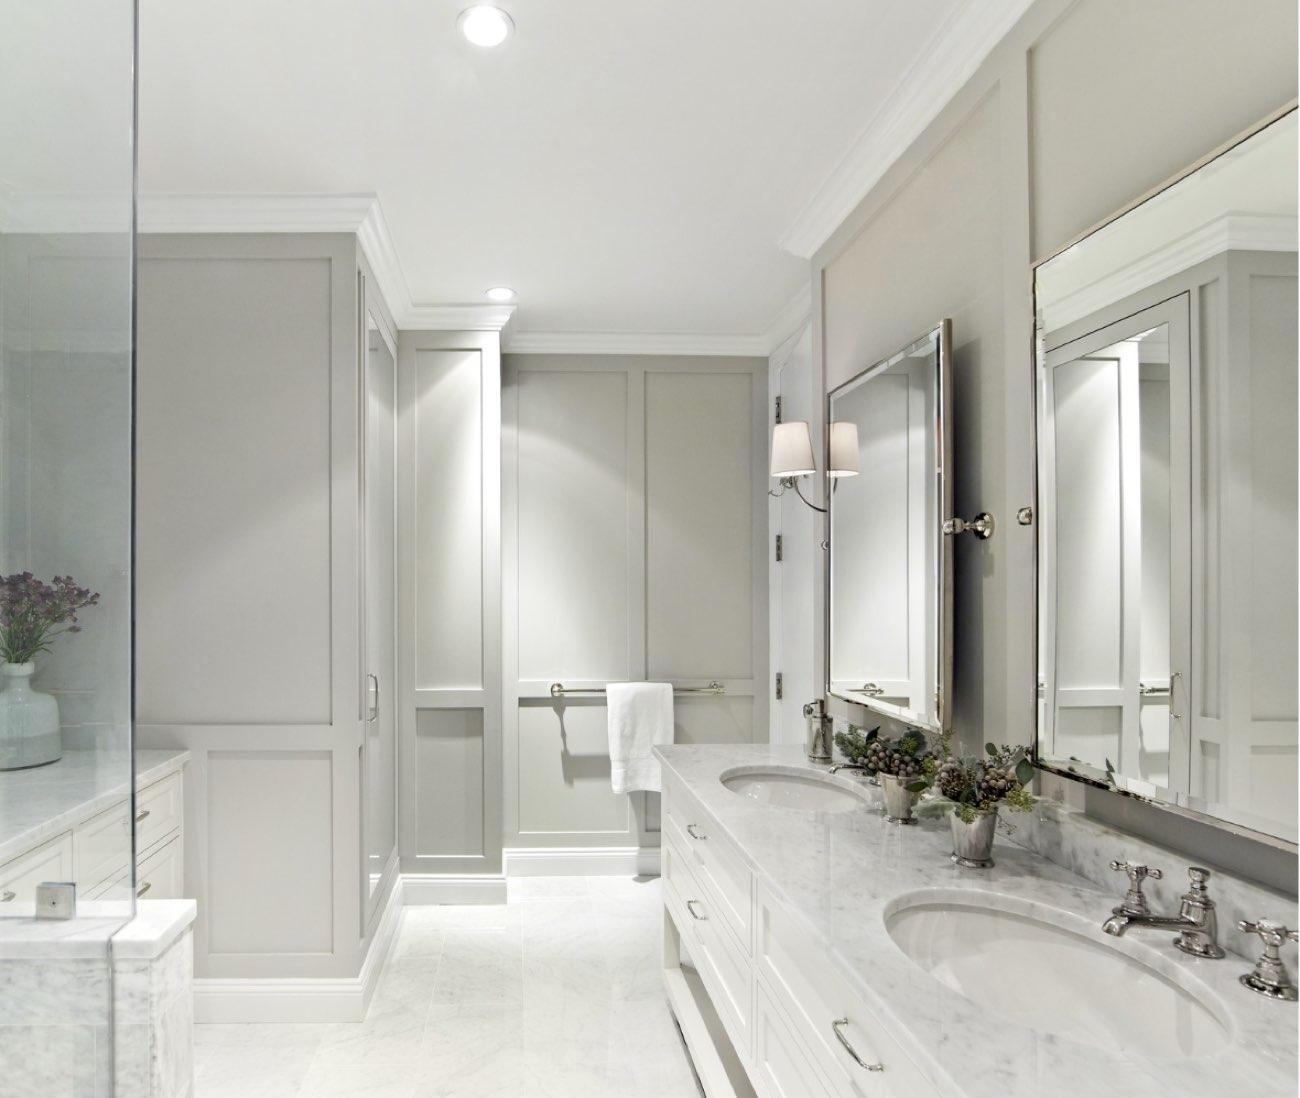 14 Best Bathroom Makeovers_ Before & After Bathroom Remodels | Architectural Digest.jpg